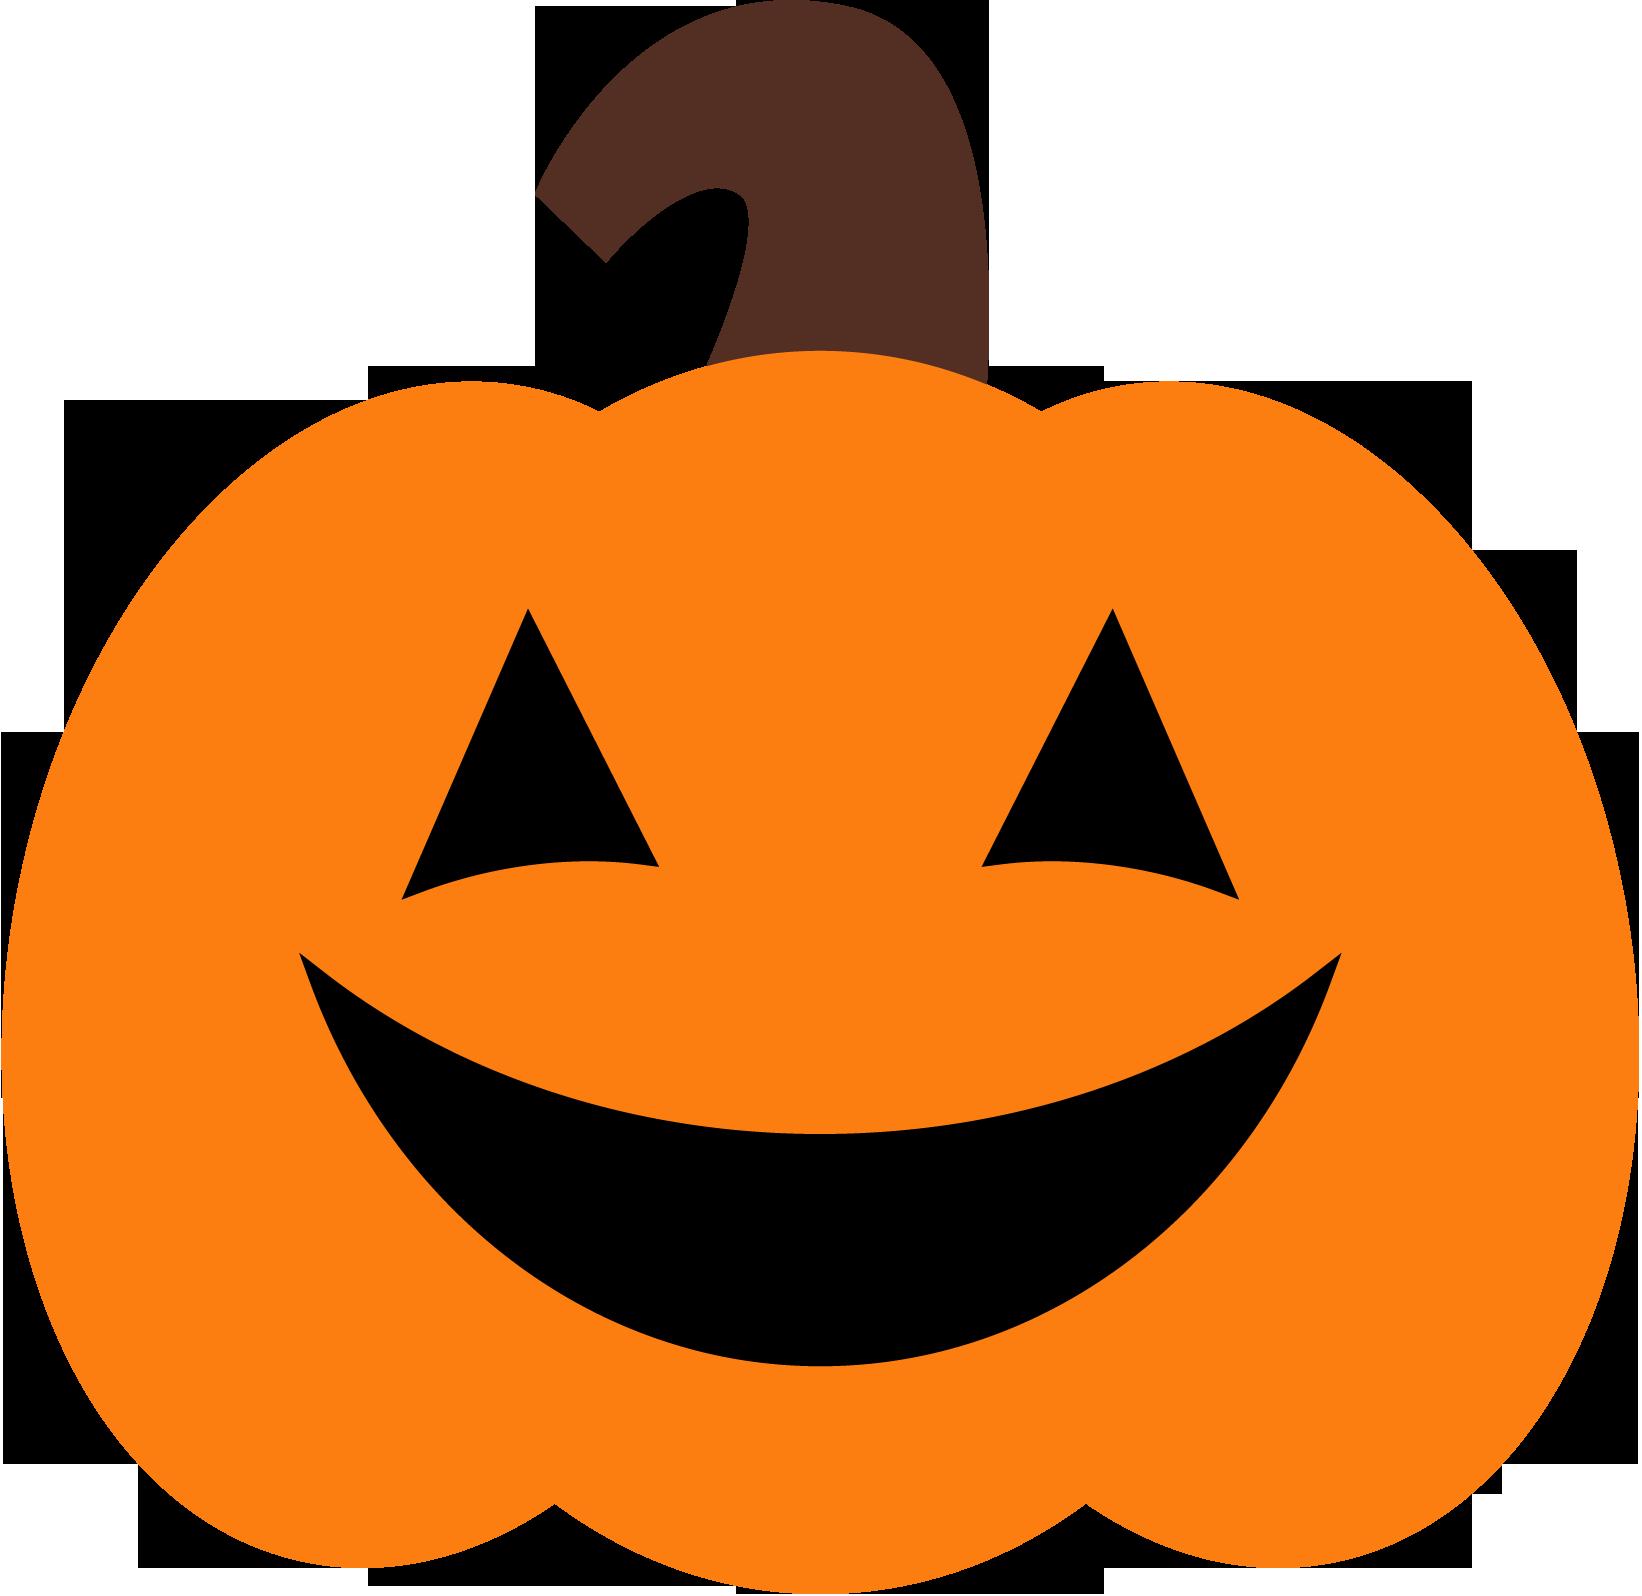 1642x1596 Pumpkin Jack O Lantern Clip Art (Free Clipart) Revidevi